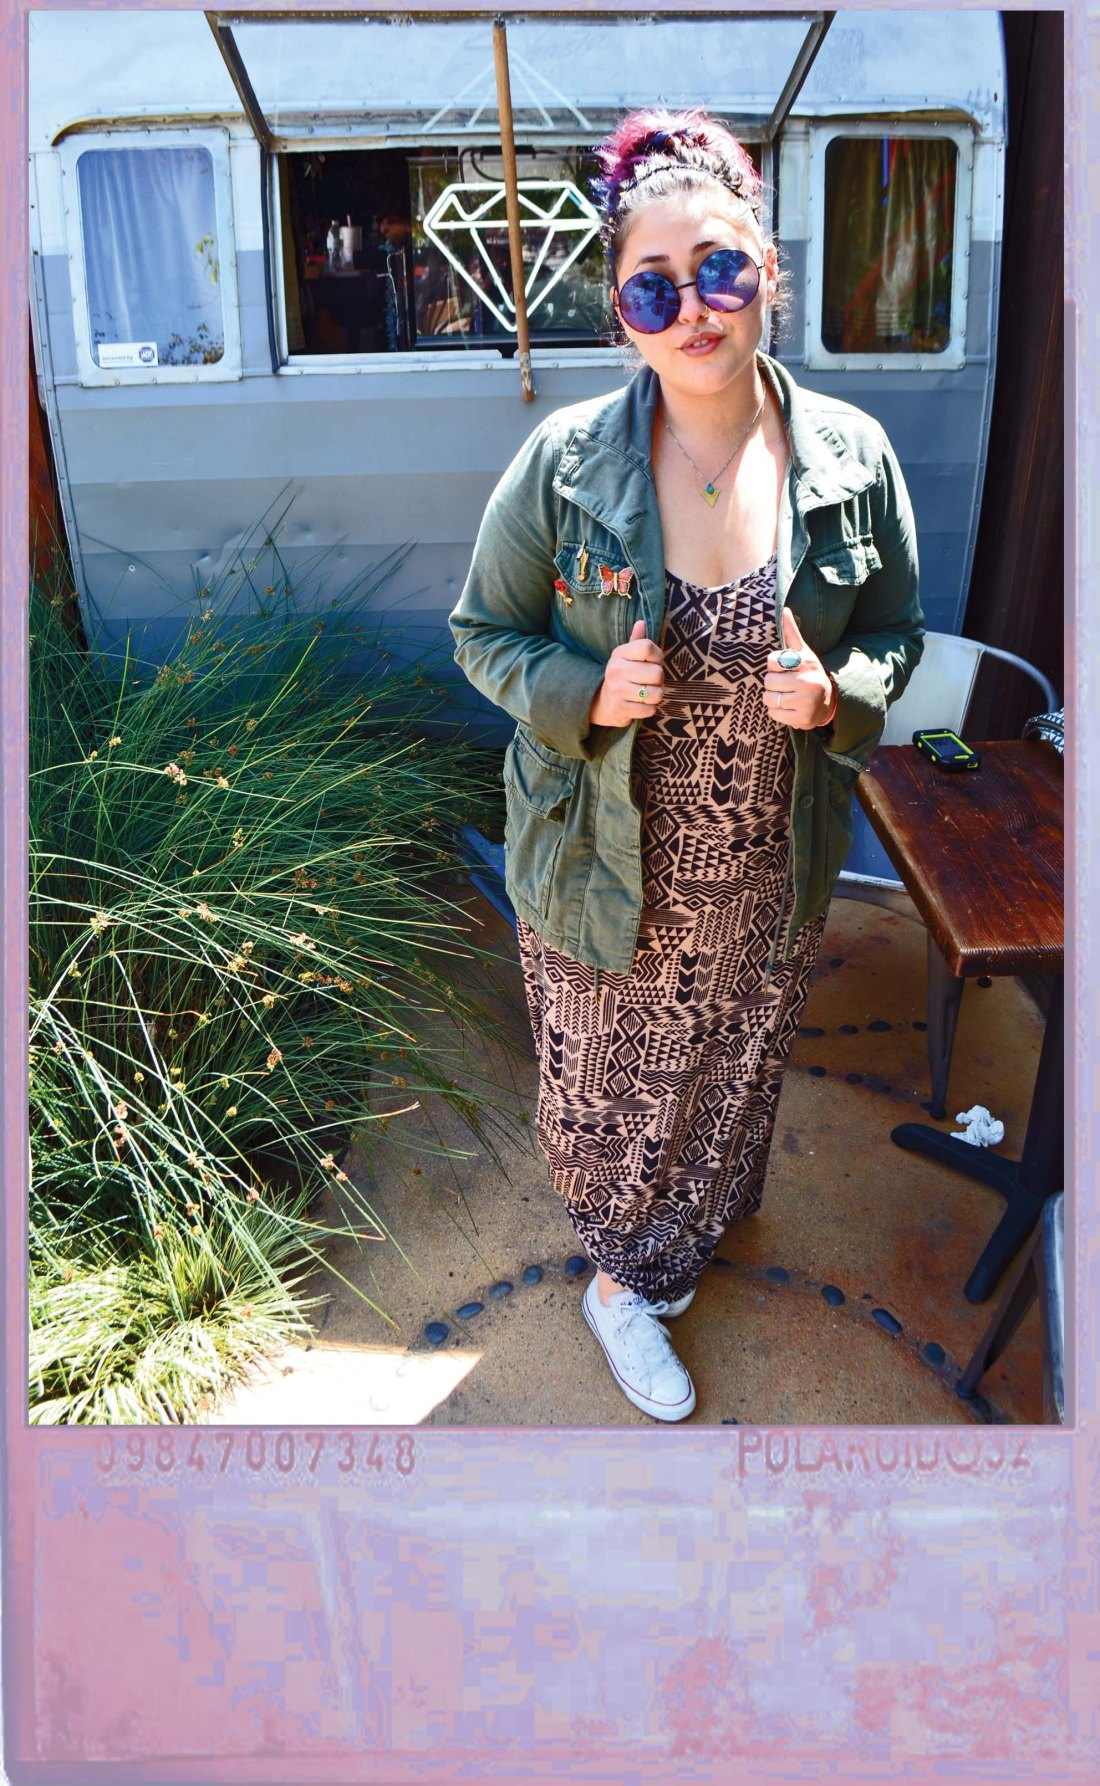 aztec dress and militant jacket